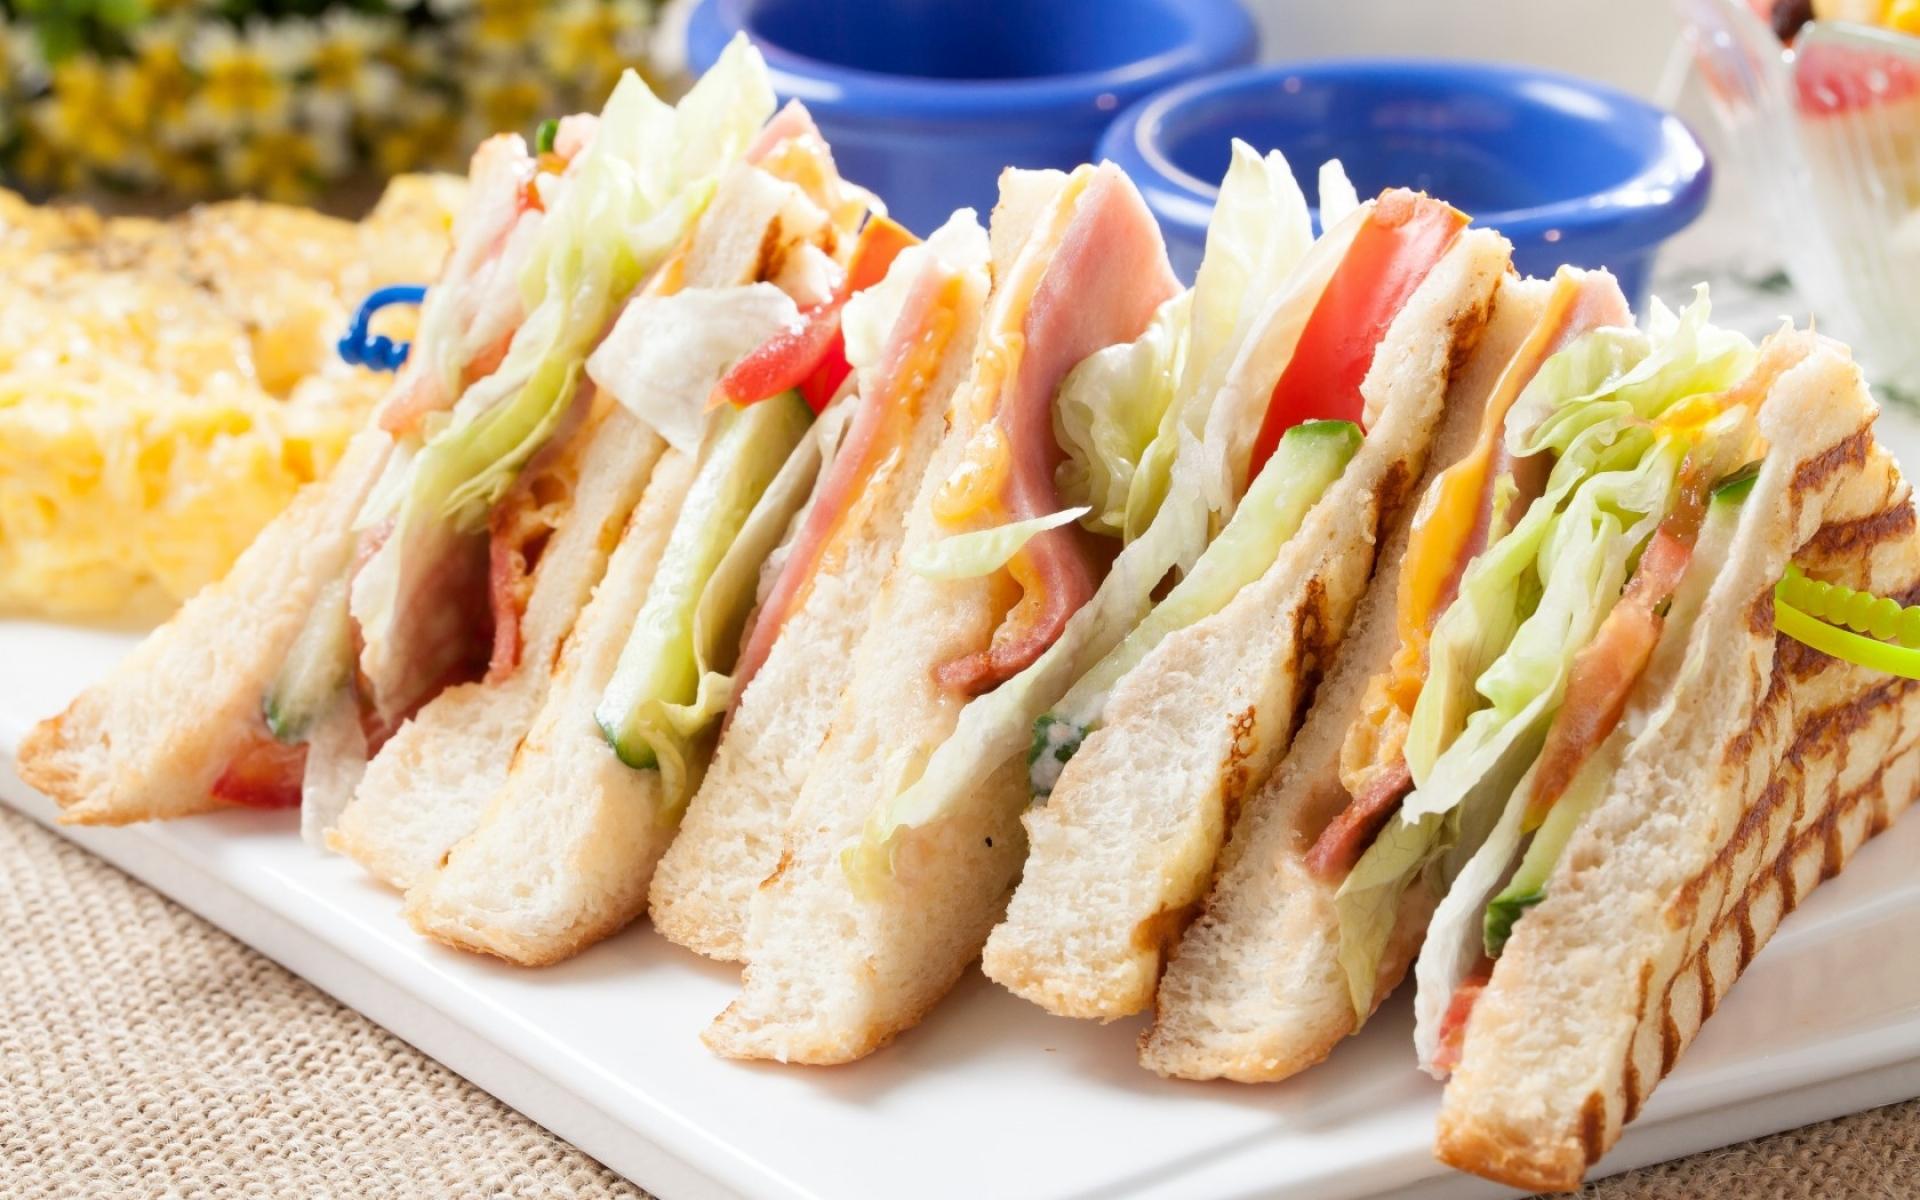 Картинки Сэндвич, хлеб, мясо, овощи фото и обои на рабочий стол